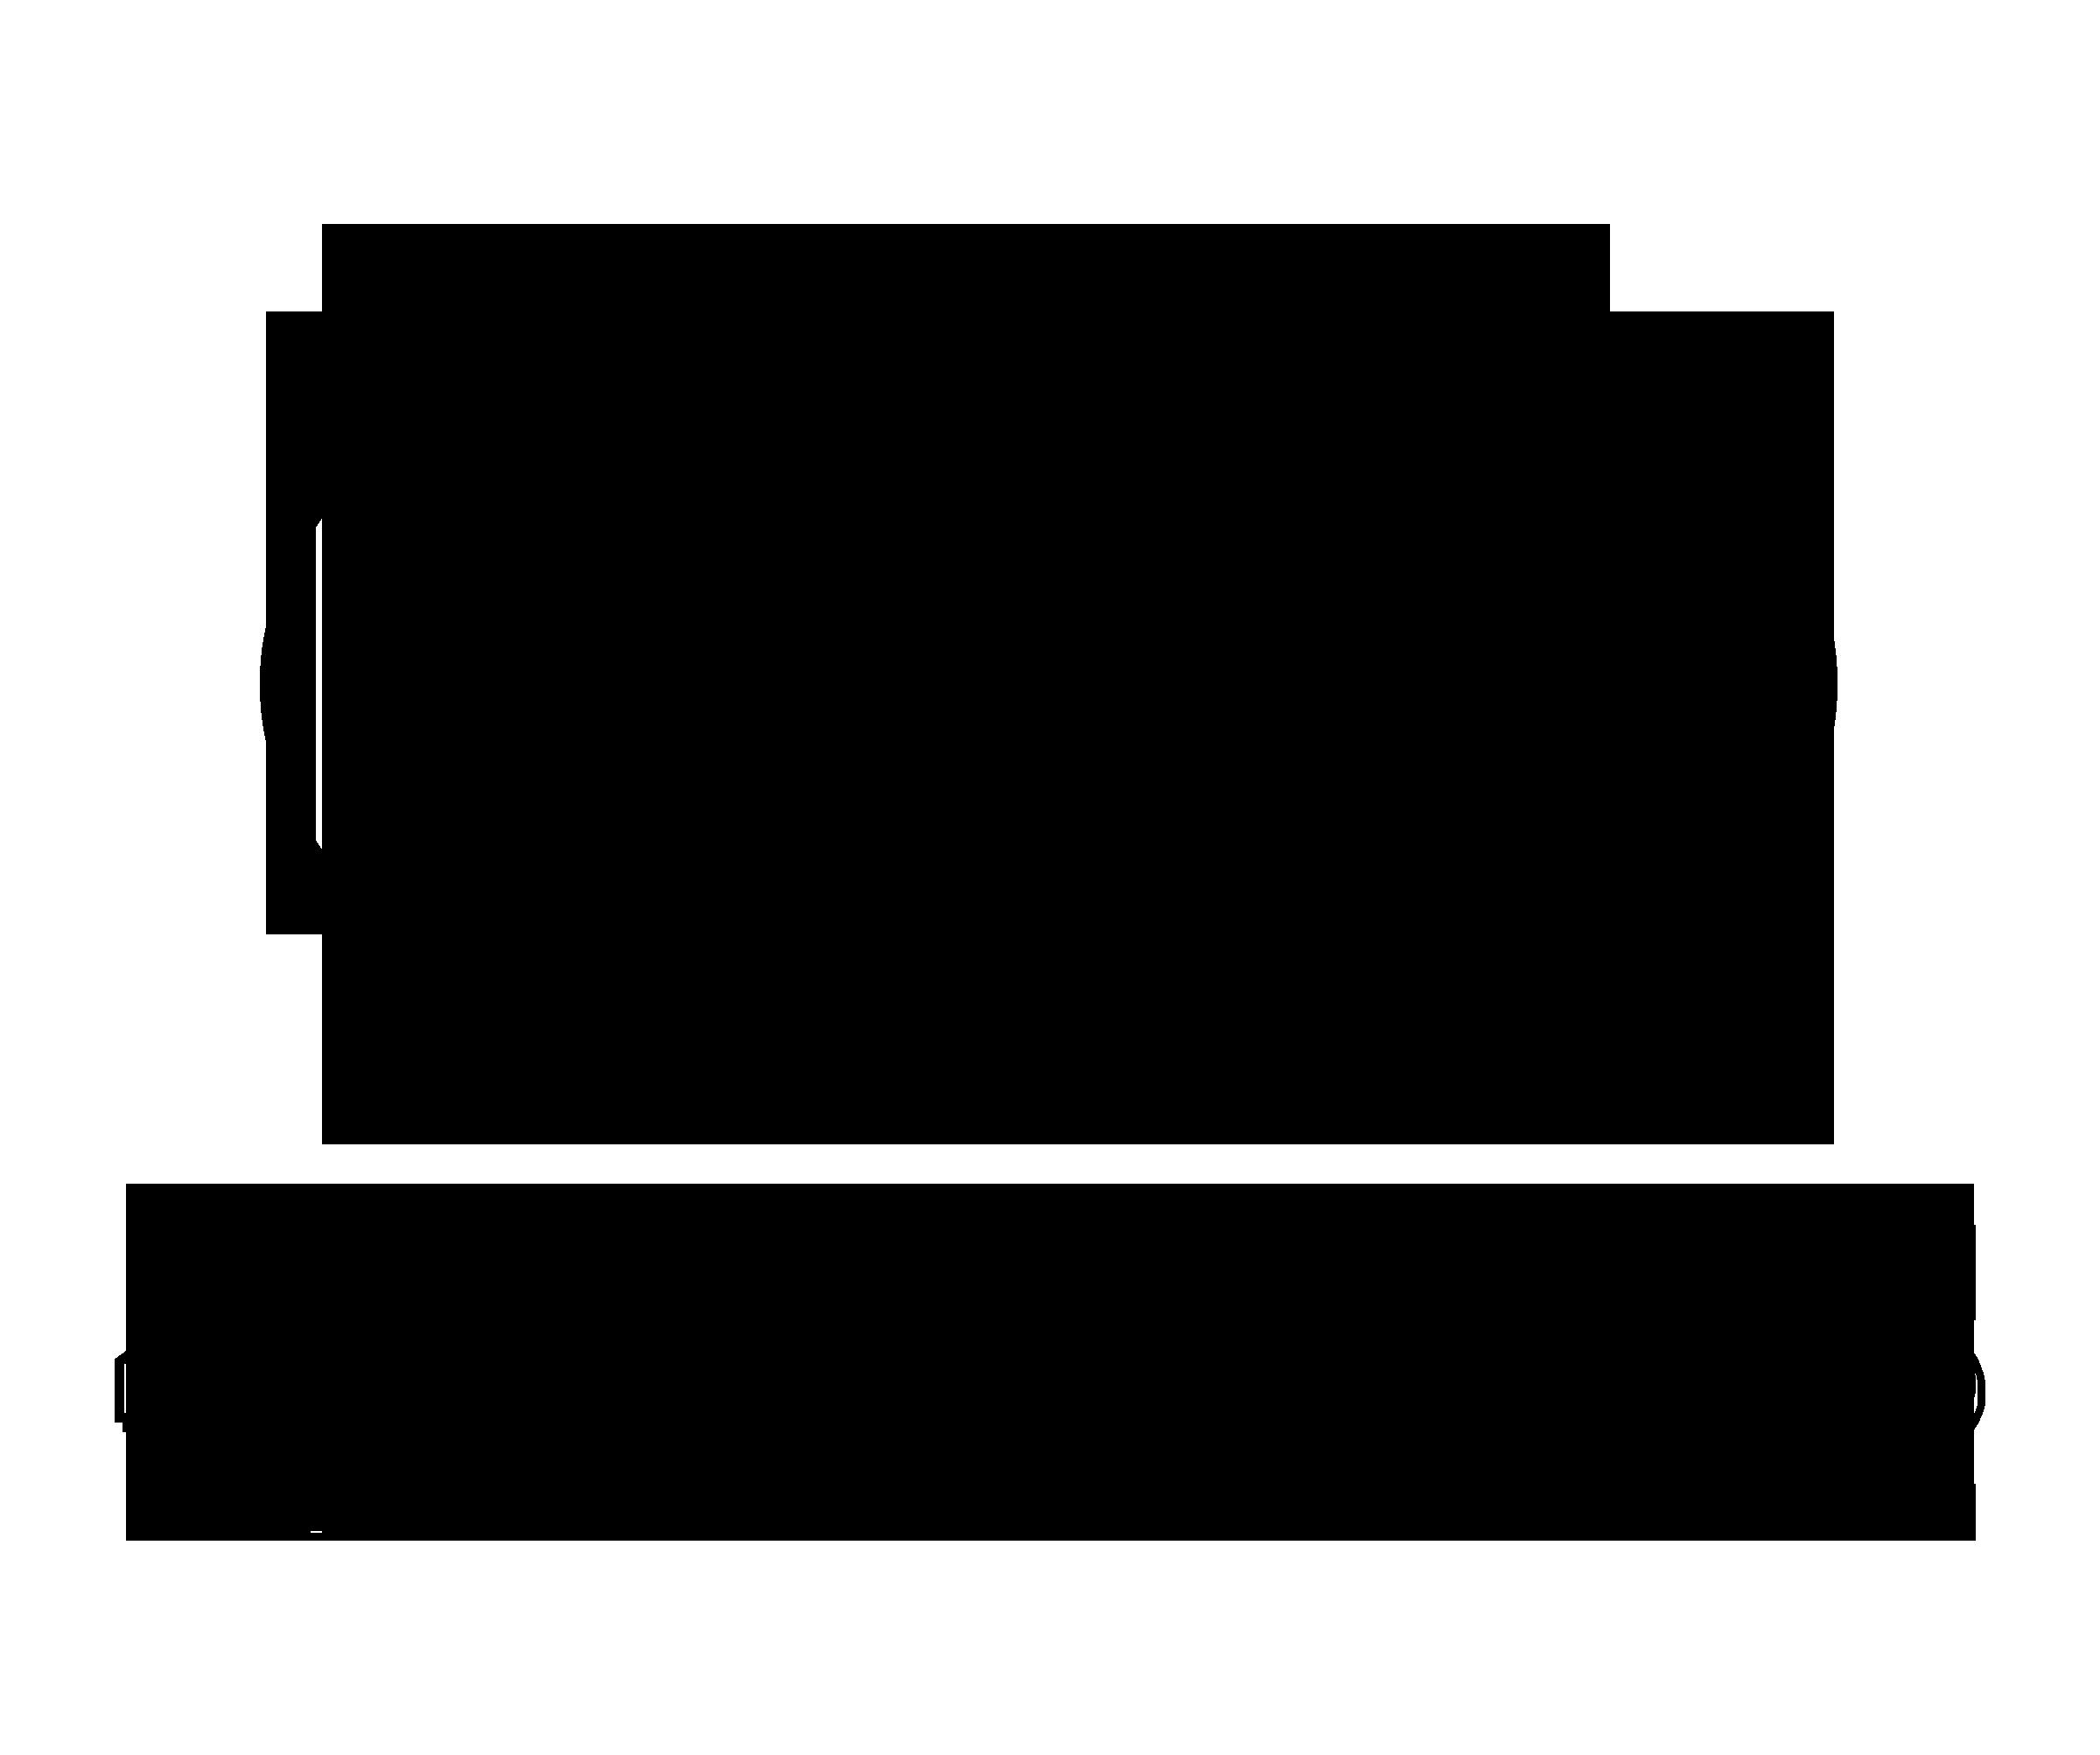 49ers black and white clipart clip transparent stock San Francisco 49ers Logo PNG Transparent & SVG Vector - Freebie Supply clip transparent stock